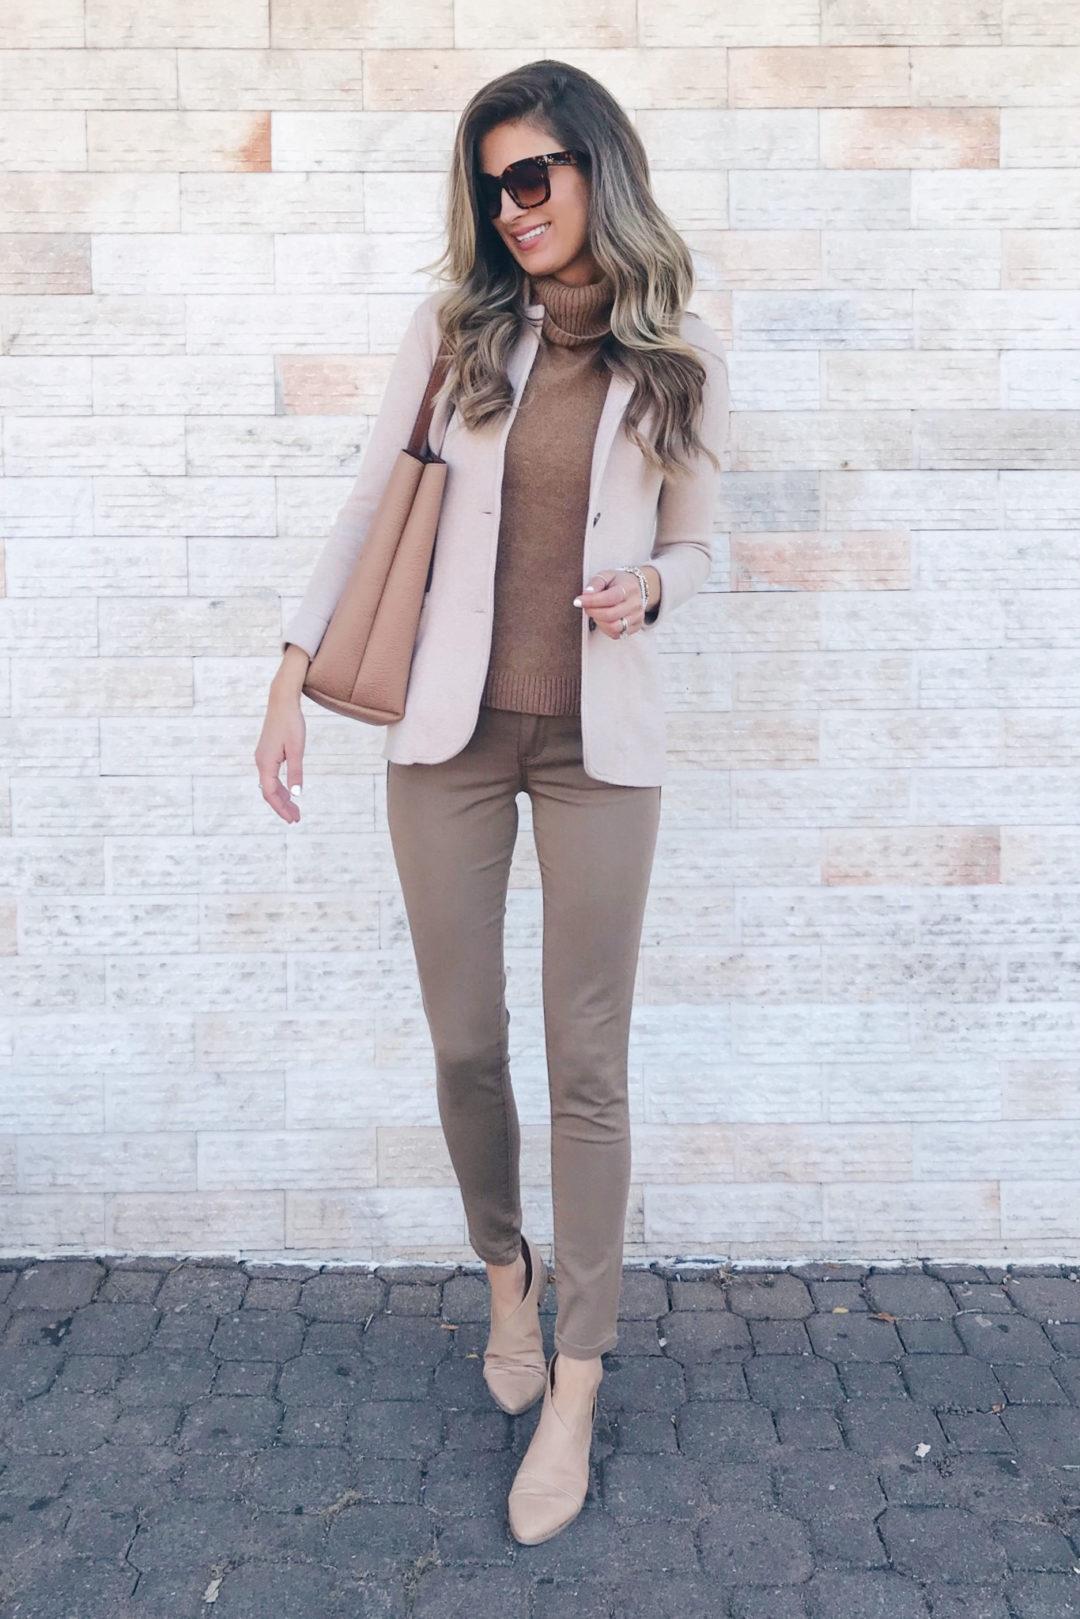 fashion blogger wearing j. crew sweater blazer - teacher outfit inspiration on pinteresting plans blog